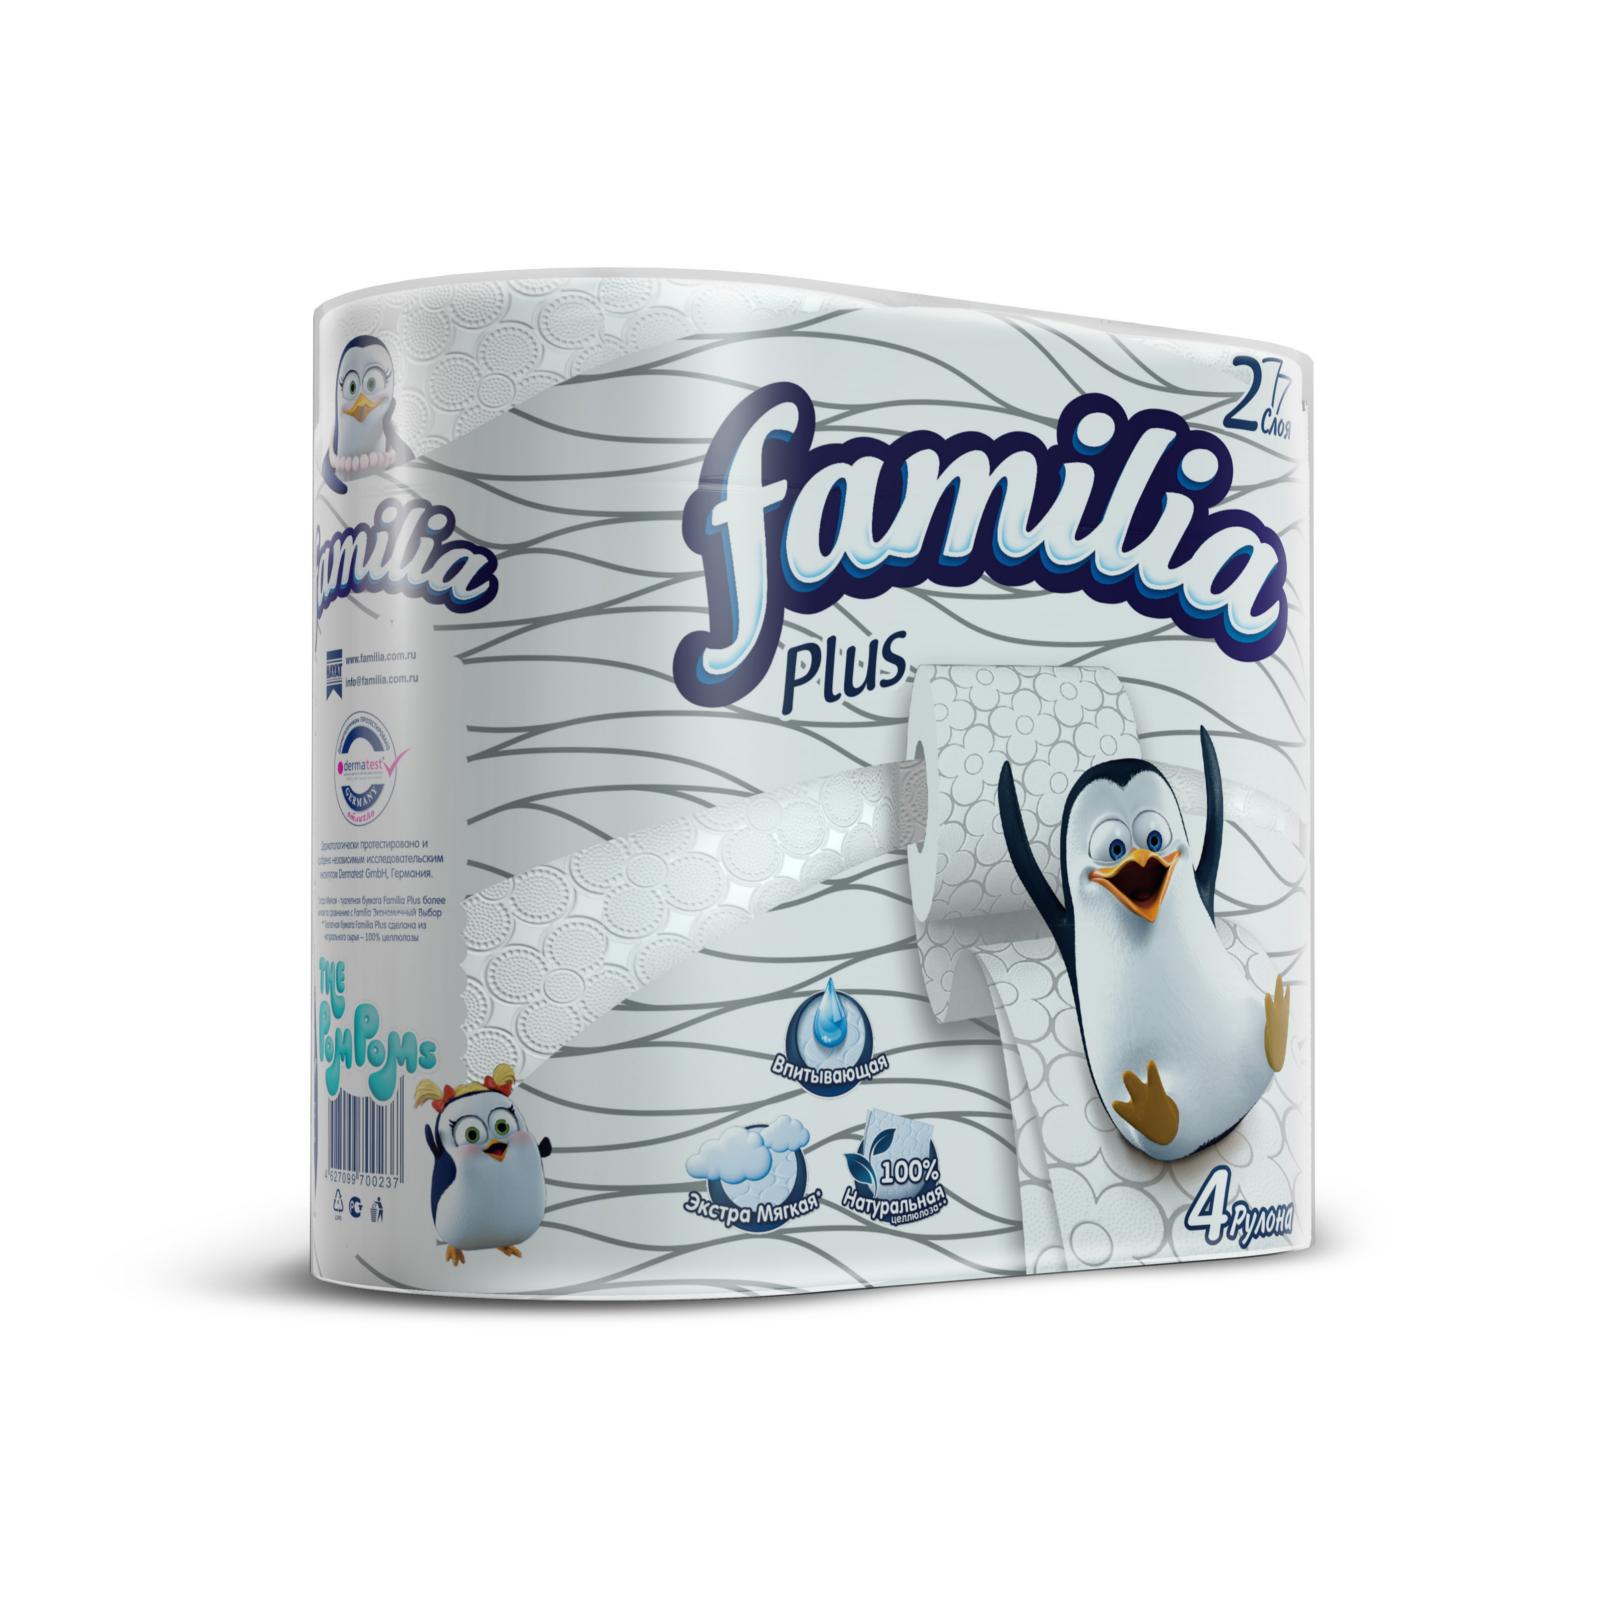 Туалетная бумага Familia Plus белая (2 слоя) 4 шт